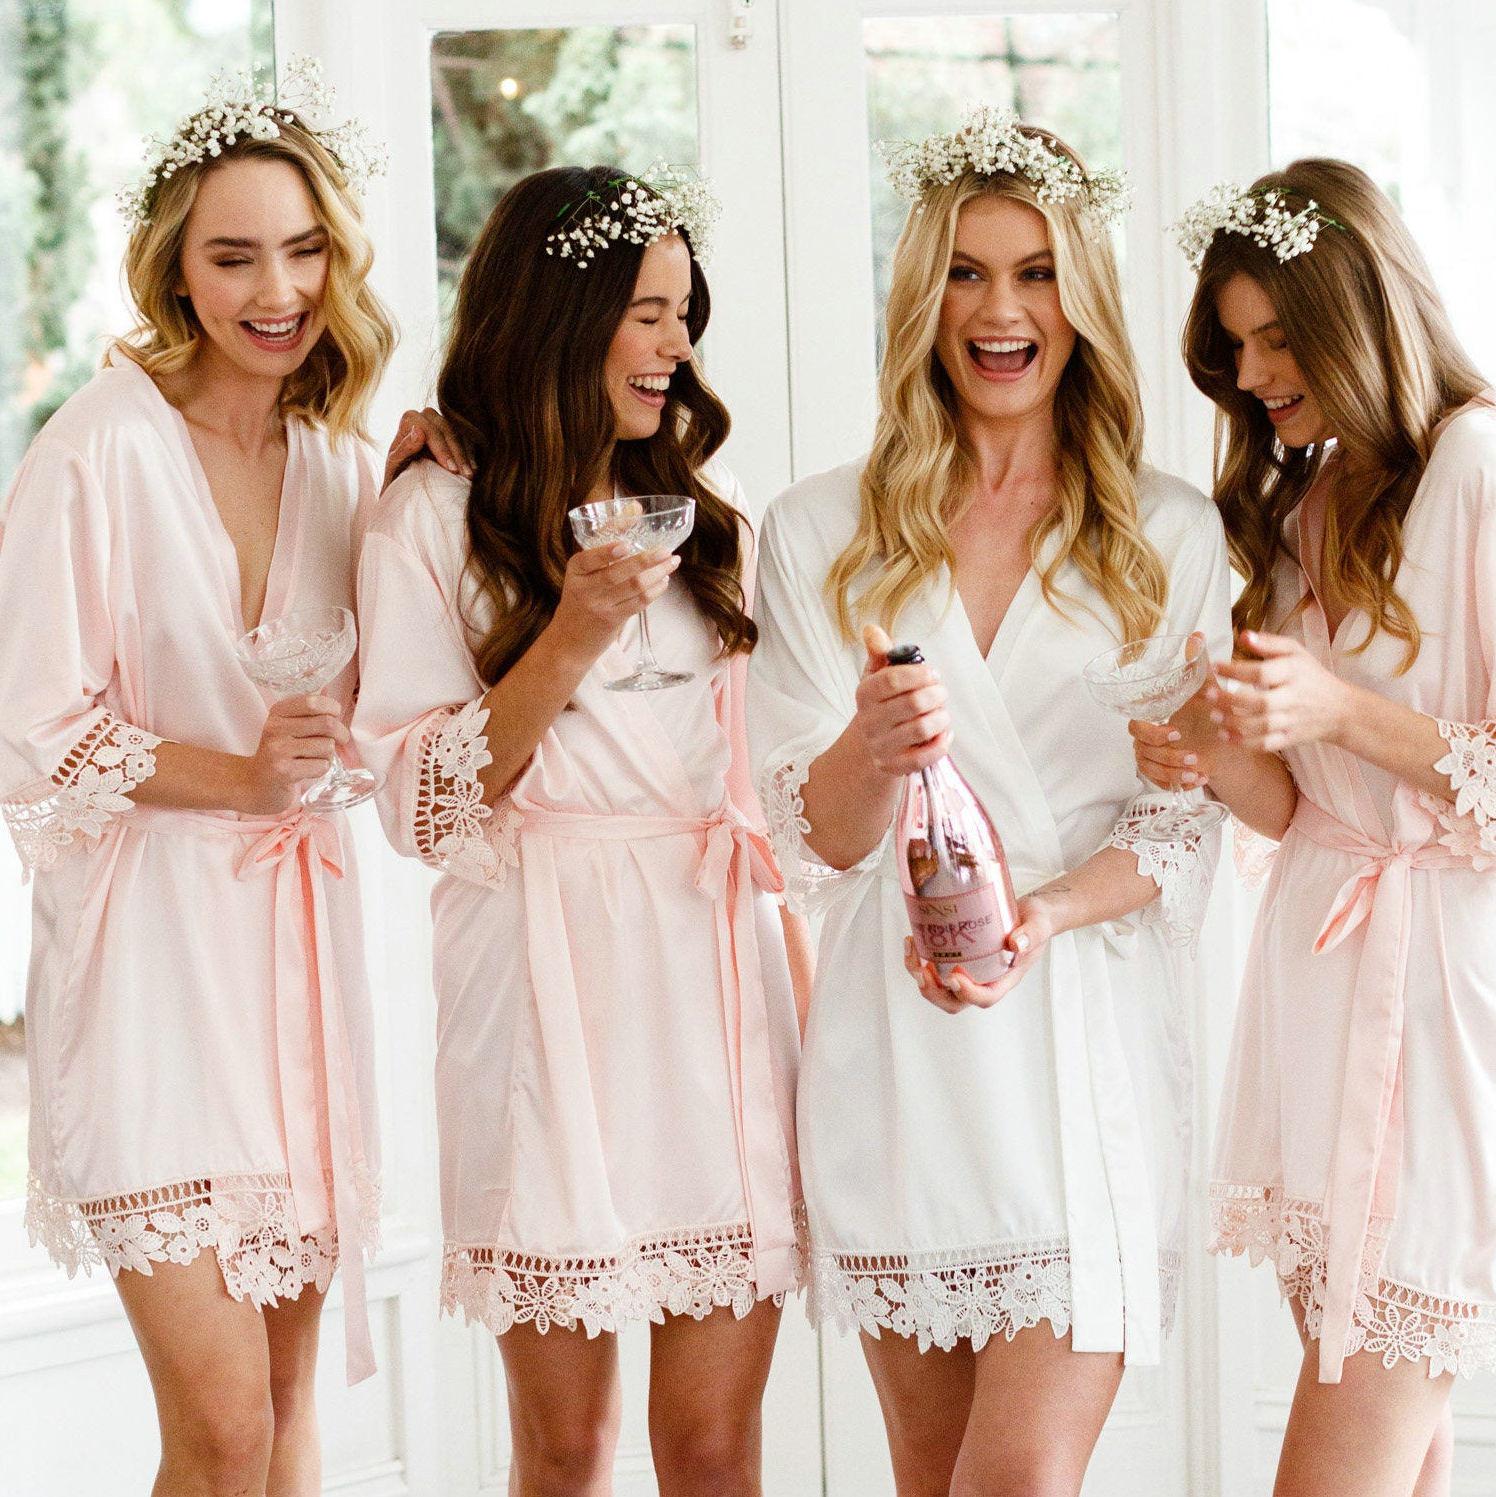 2020 Women Matt Satin Lace Robe Bride Robe Bridesmaid Robes Bridal Wedding Robe Bathrobe Sleepwear Dressing White Robes